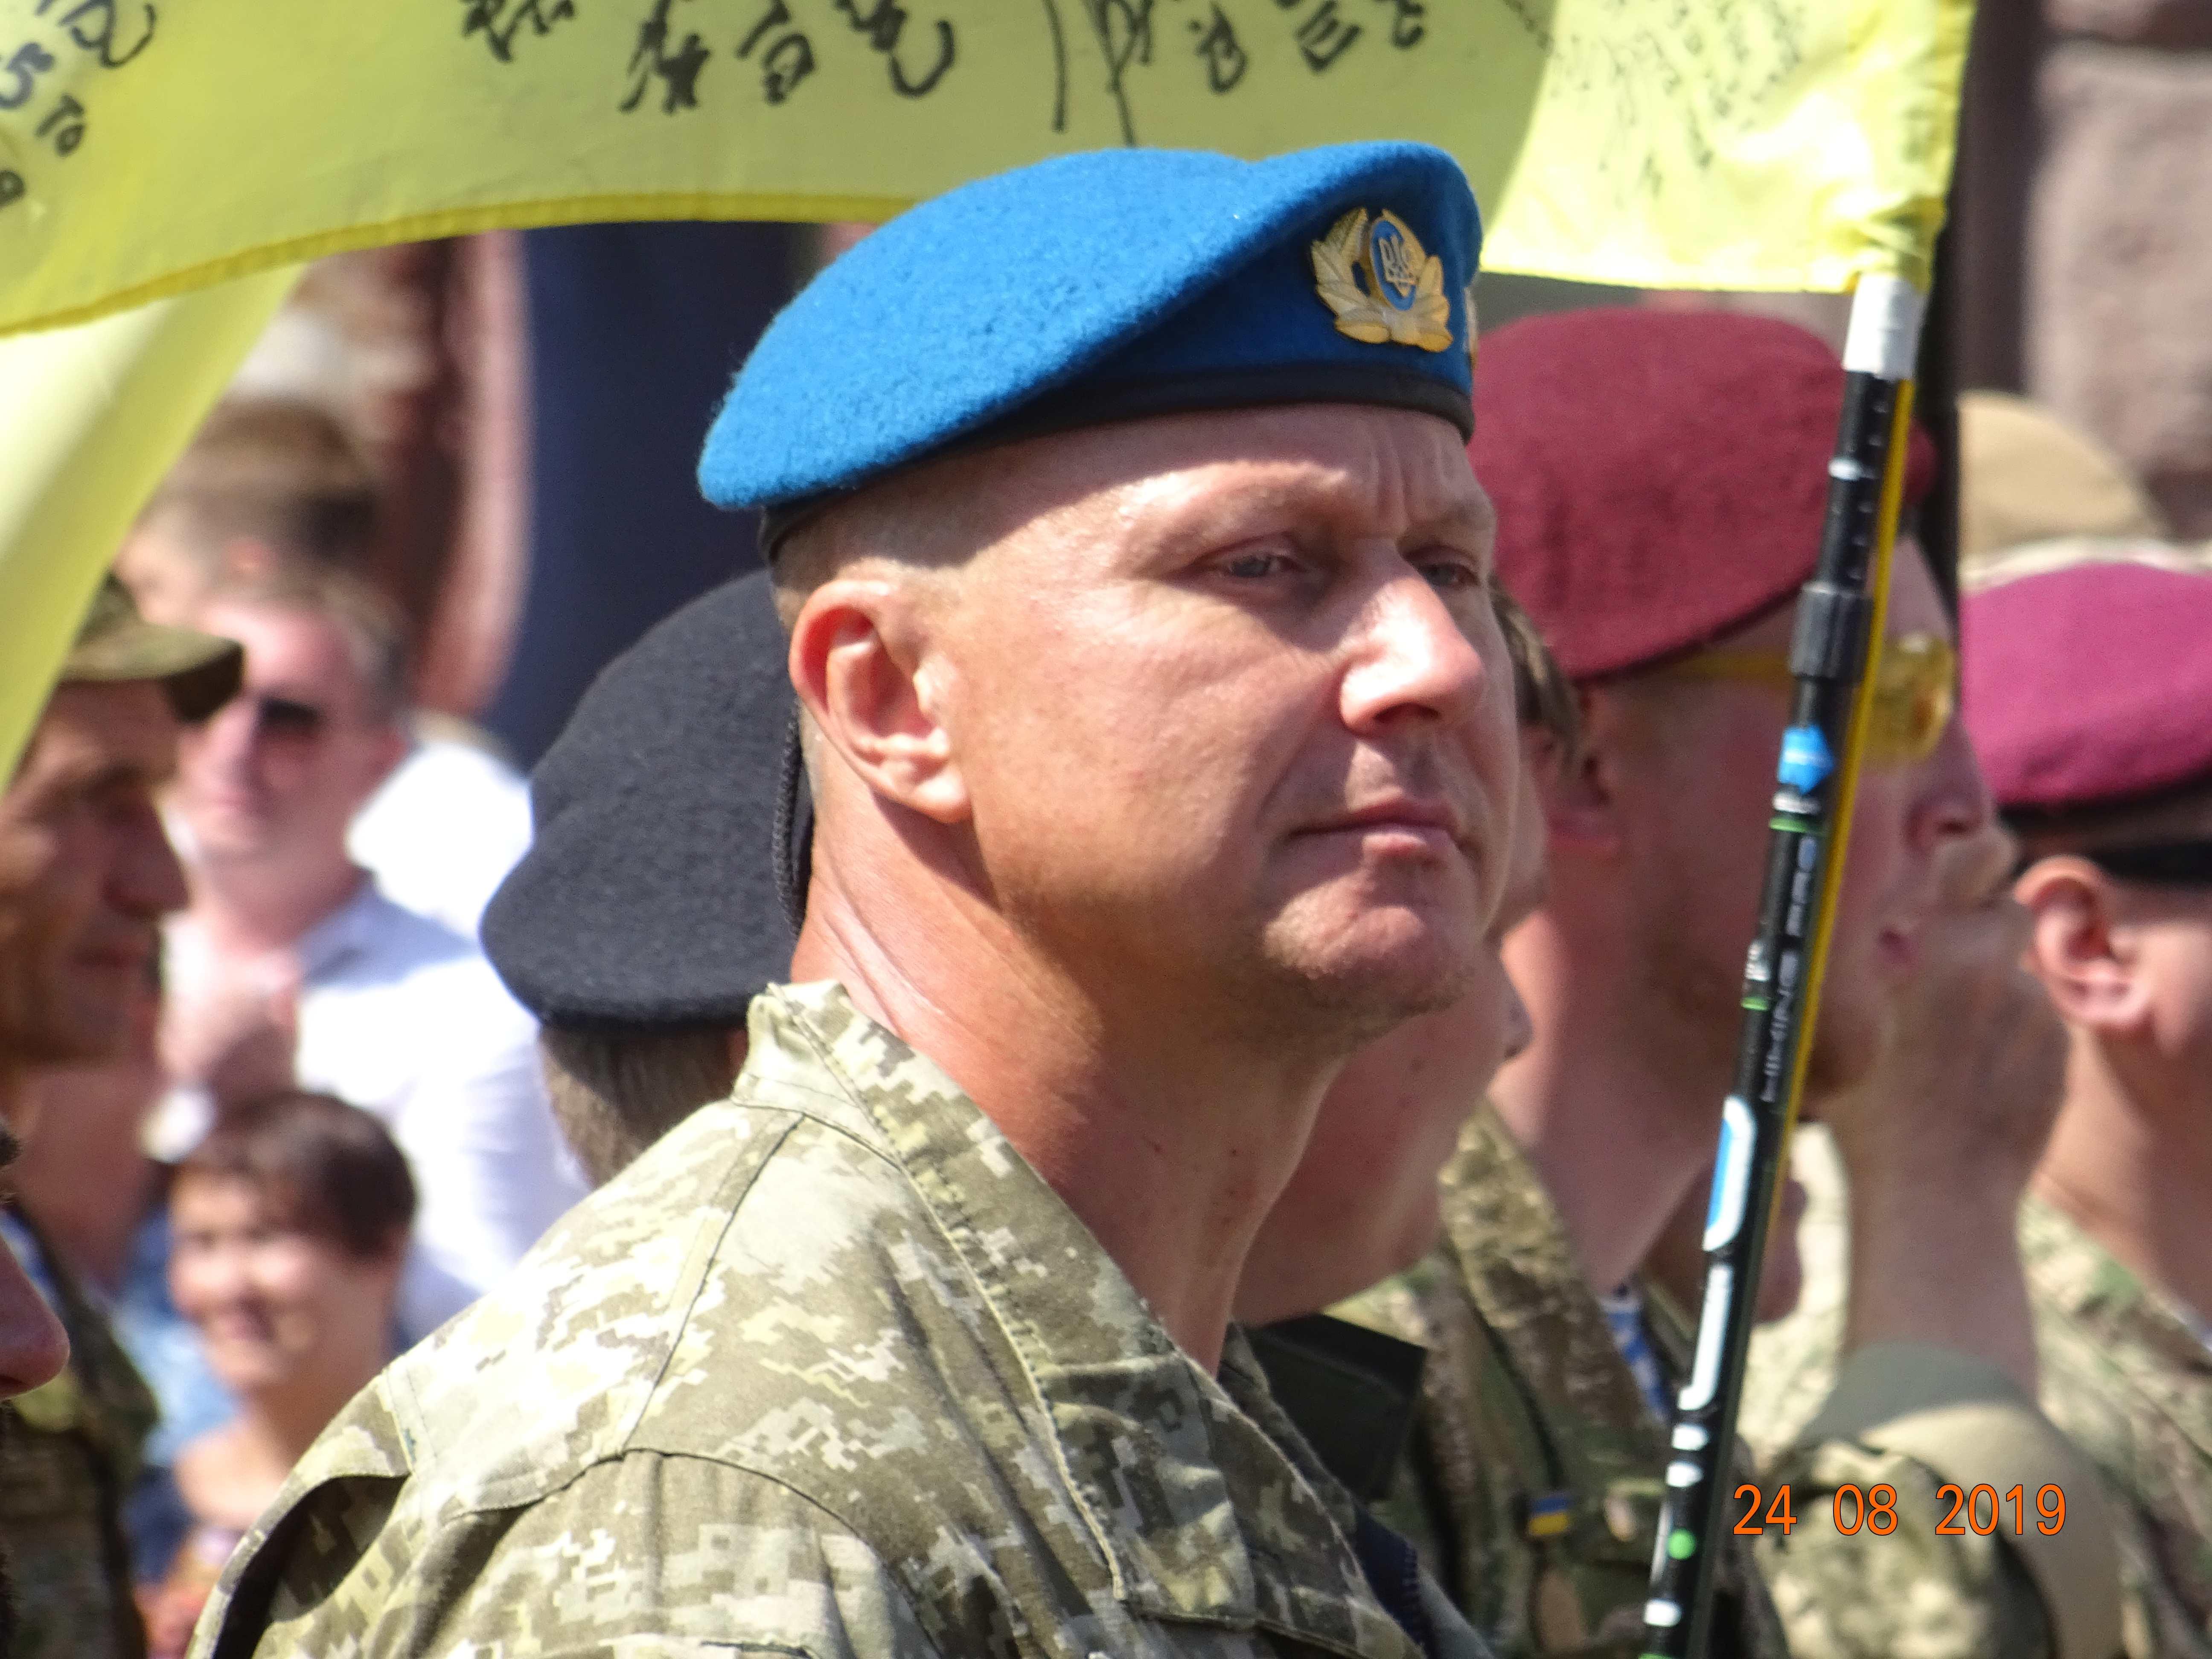 Defenders-of-Ukraine-Parad-24.Aug.19 - DSC06327.jpg